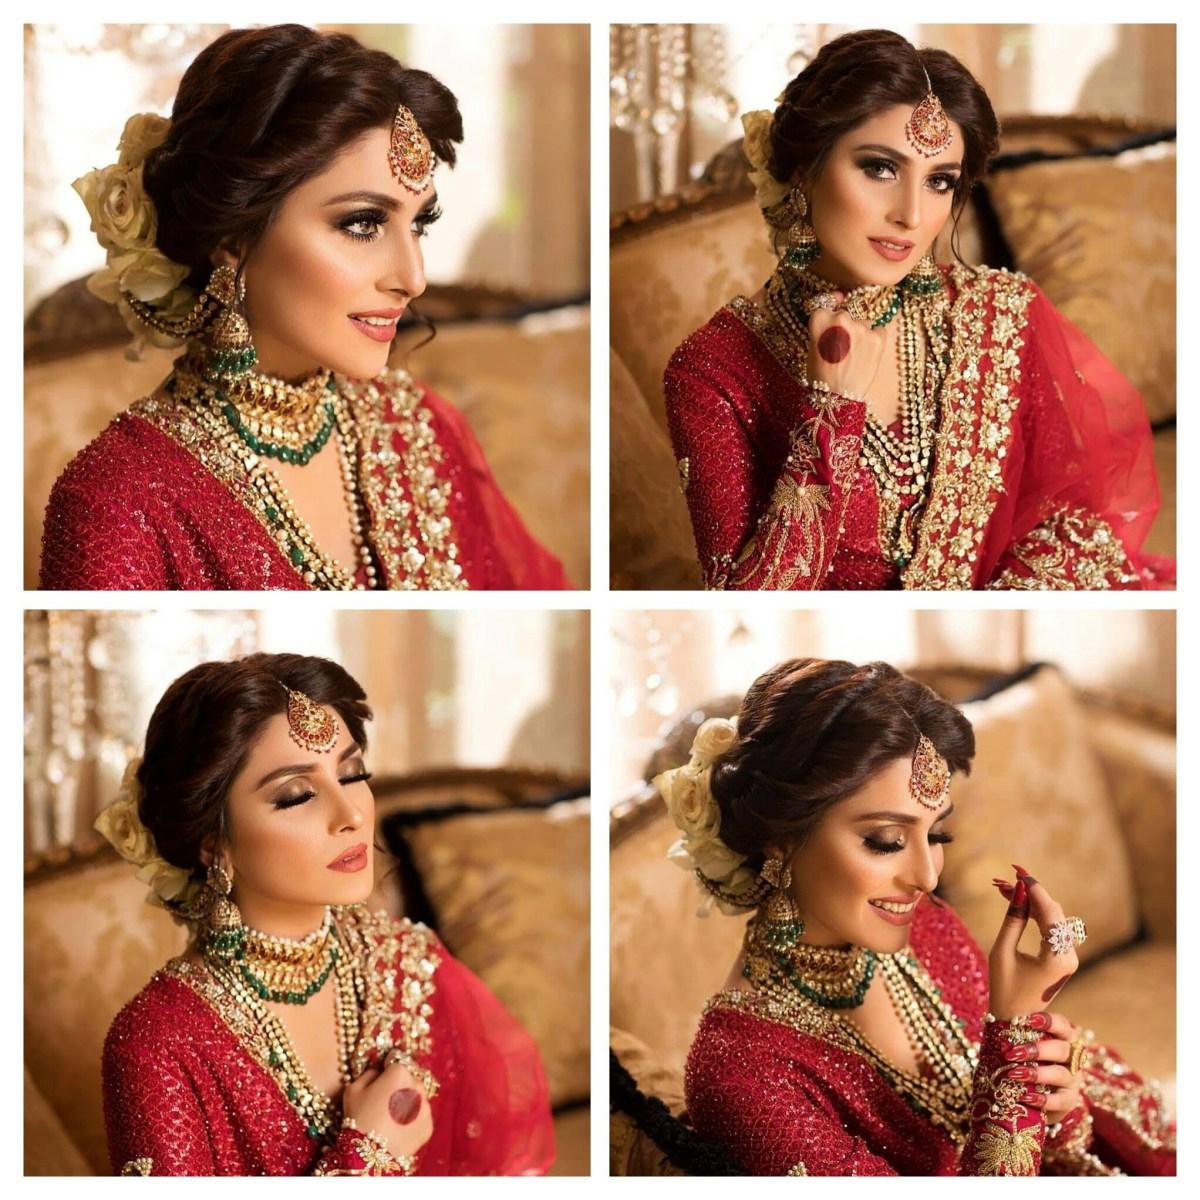 Social Media Loved New Bridal Photoshoot of Actress Ayeza Khan